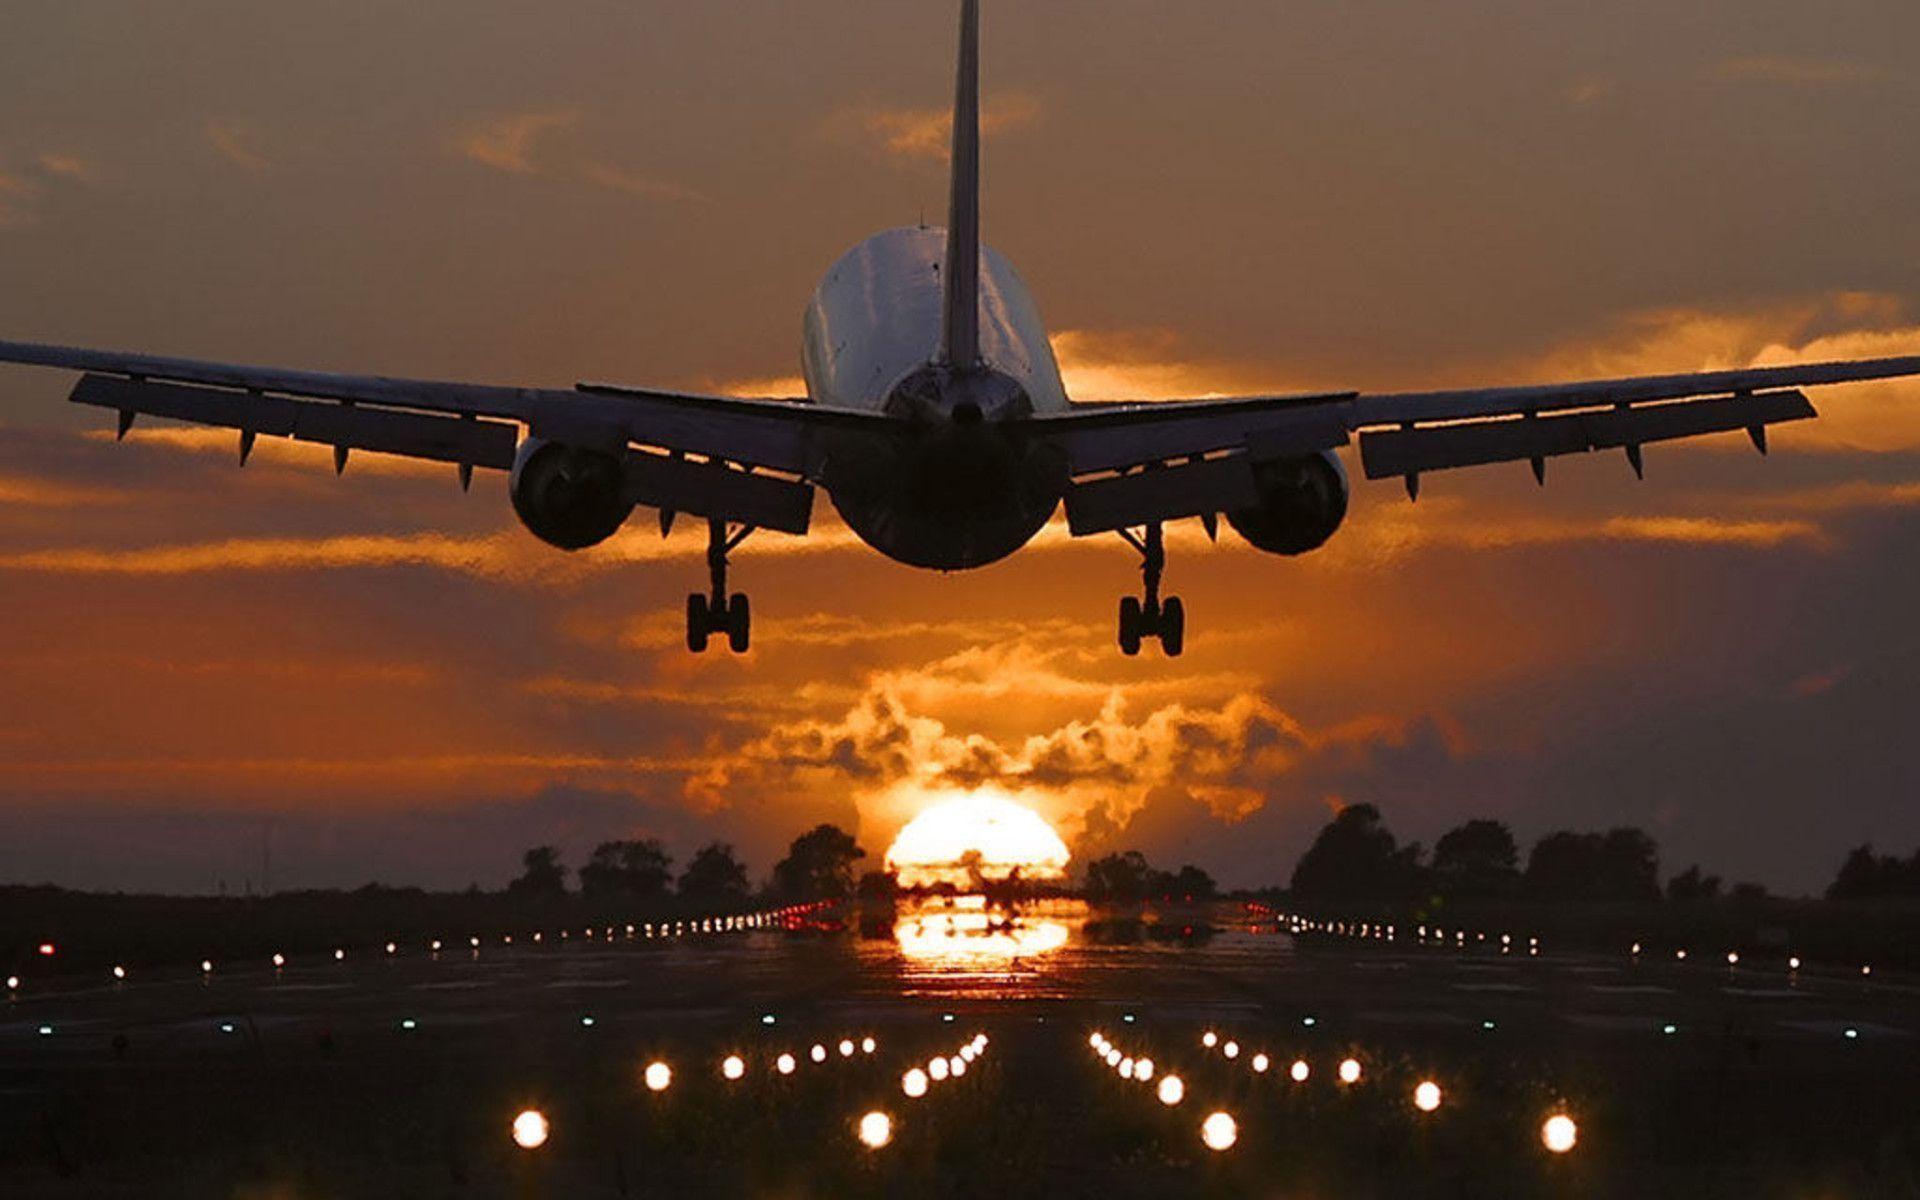 Aeroplane Wallpaper ①